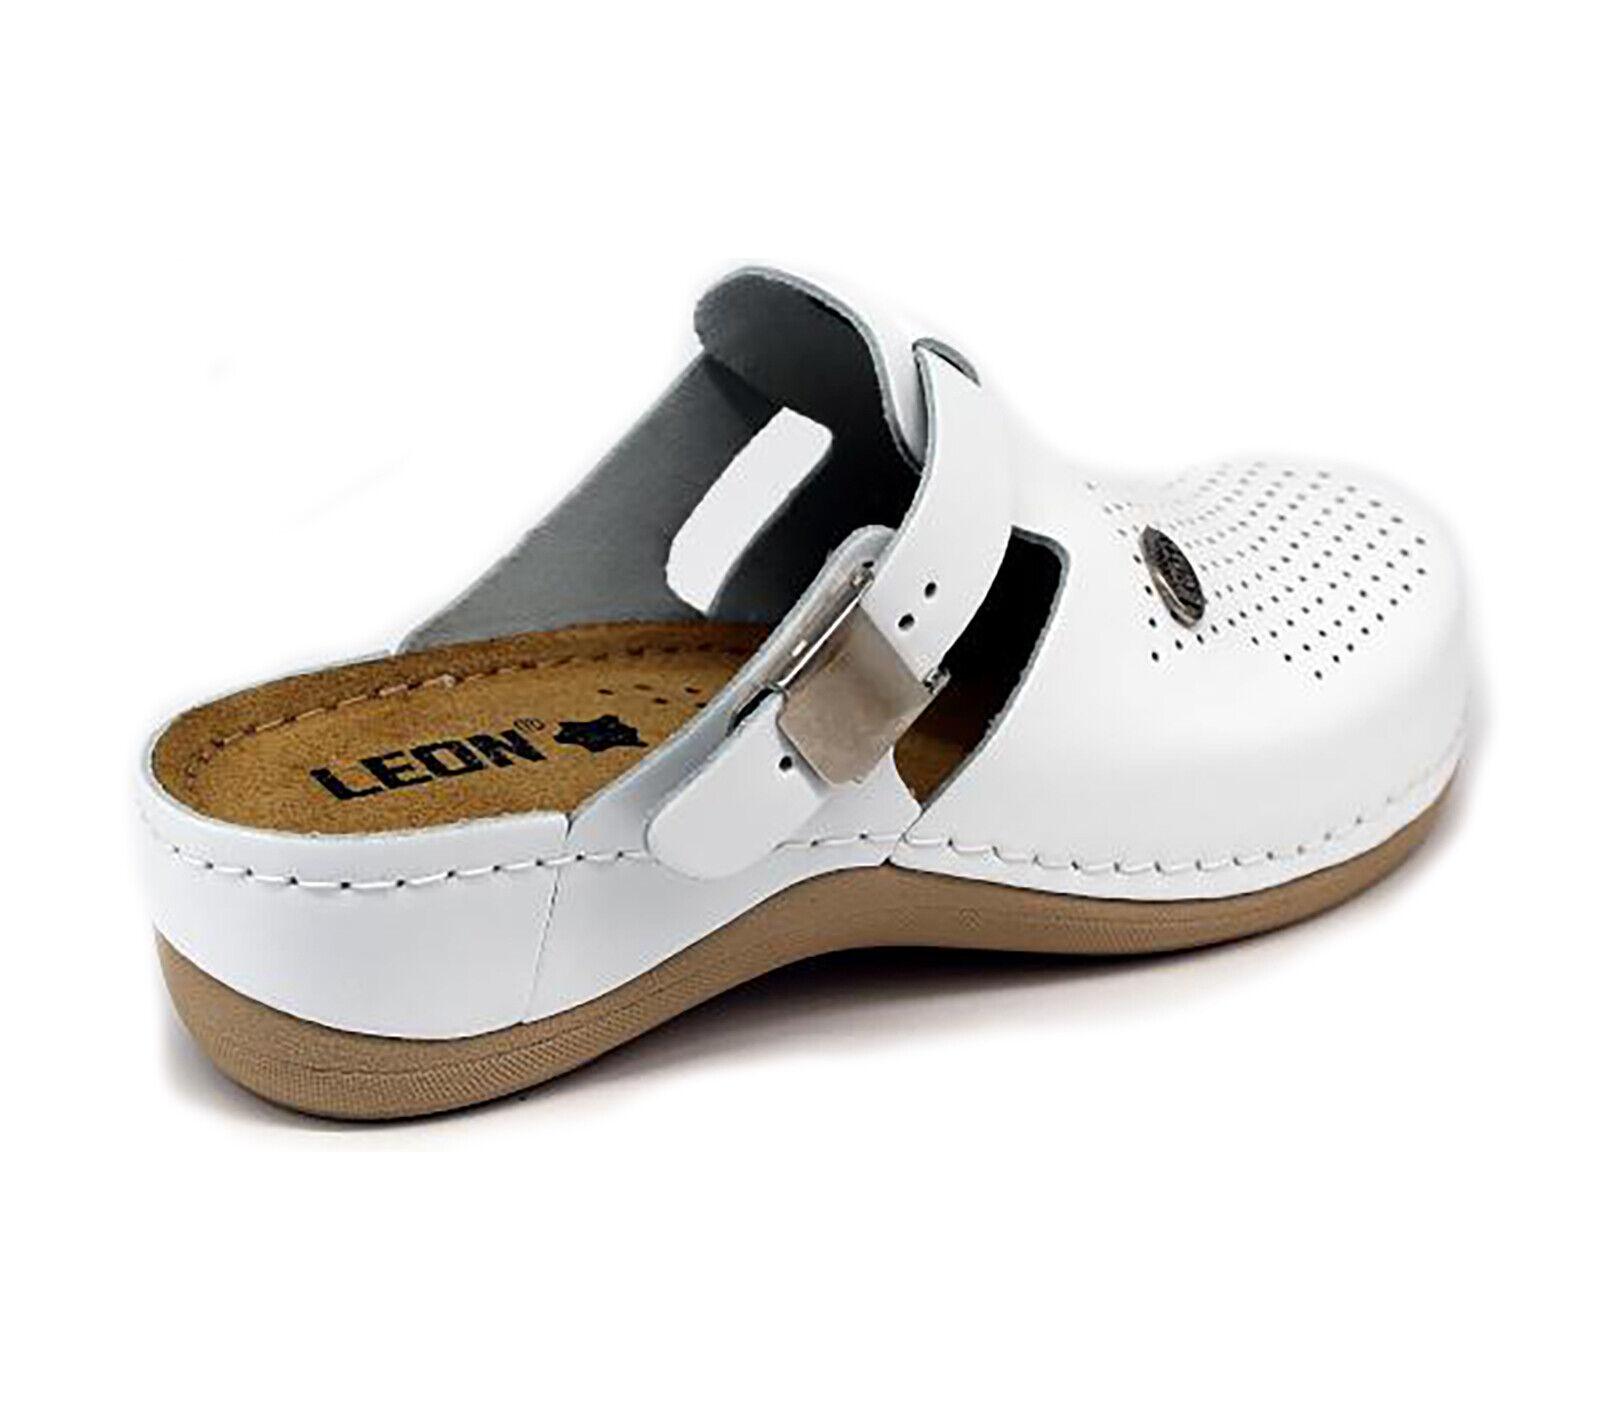 LEON 900 900 900 Ladies Women Leather Slip On Mules Clogs Slippers Sandals, White New UK 2ac15b